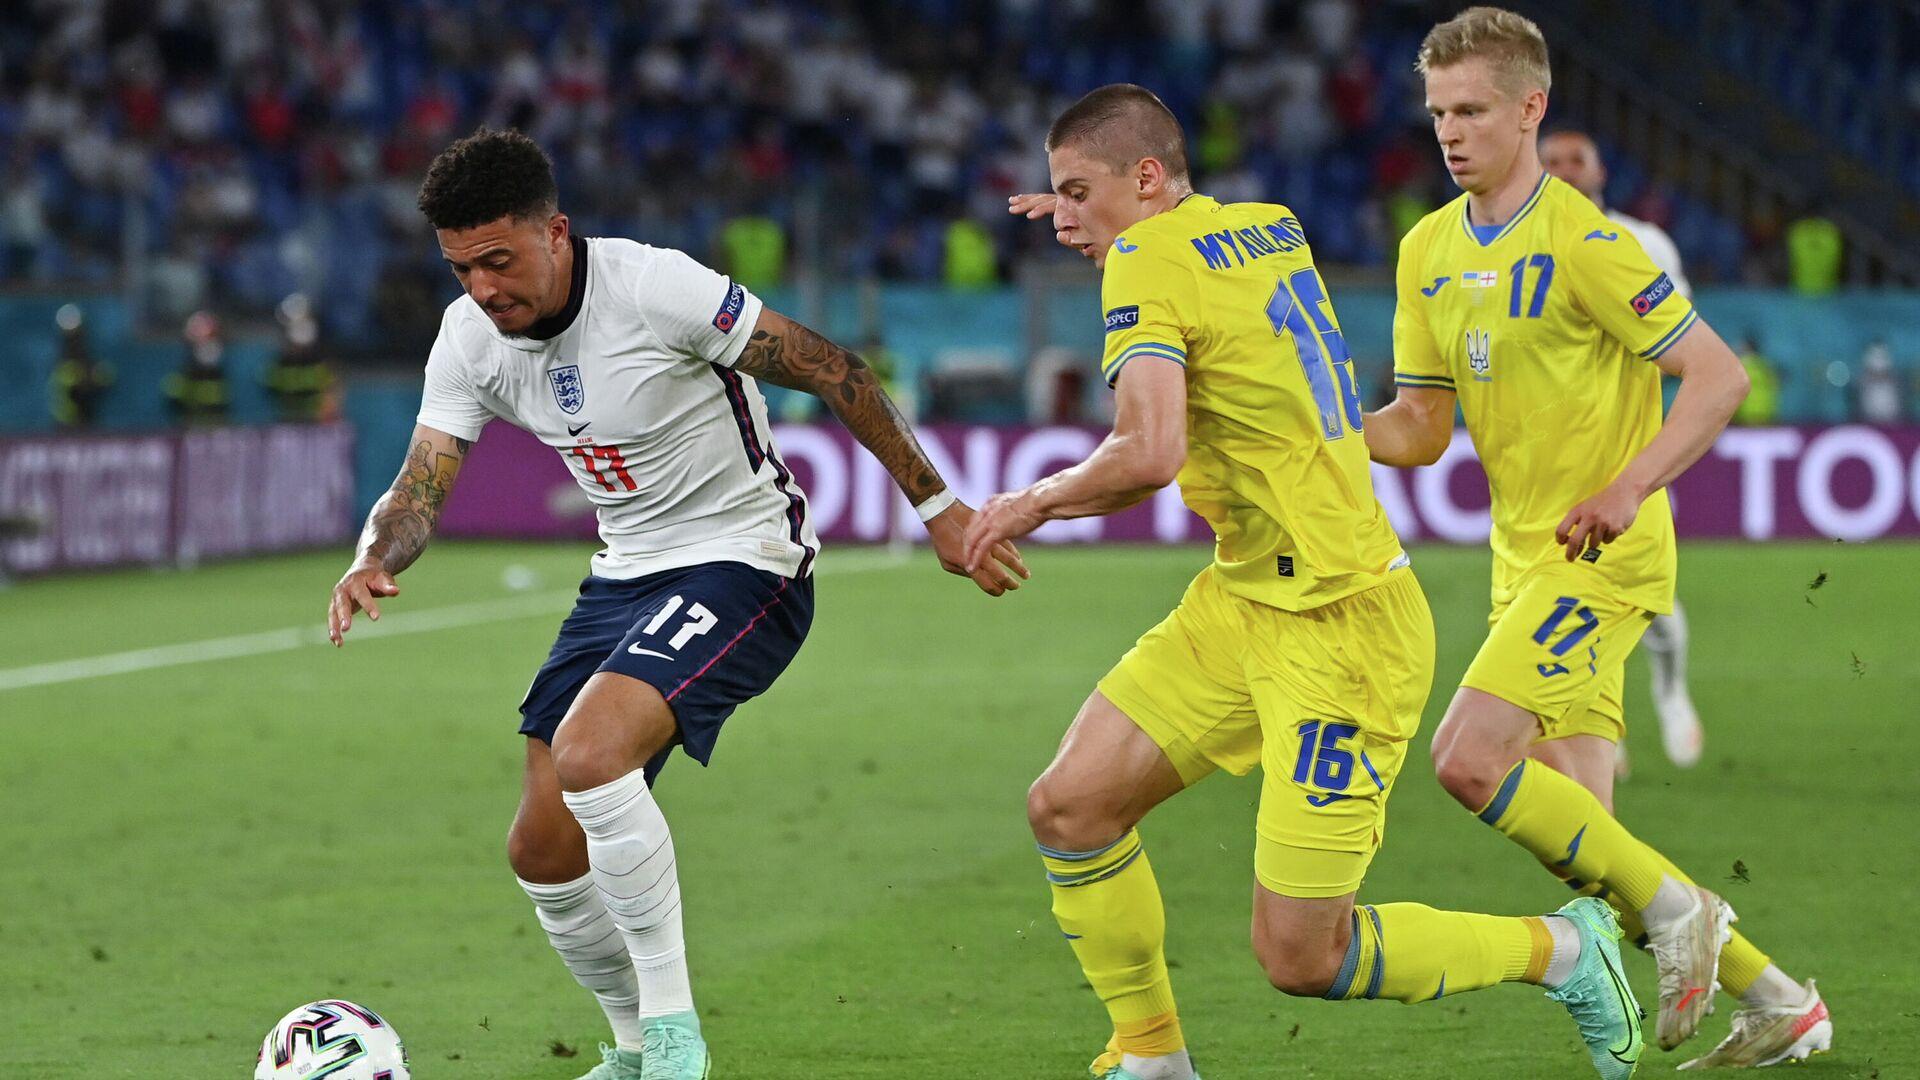 Эпизод матча Украина - Англия на ЕВРО-2020 - РИА Новости, 1920, 04.07.2021